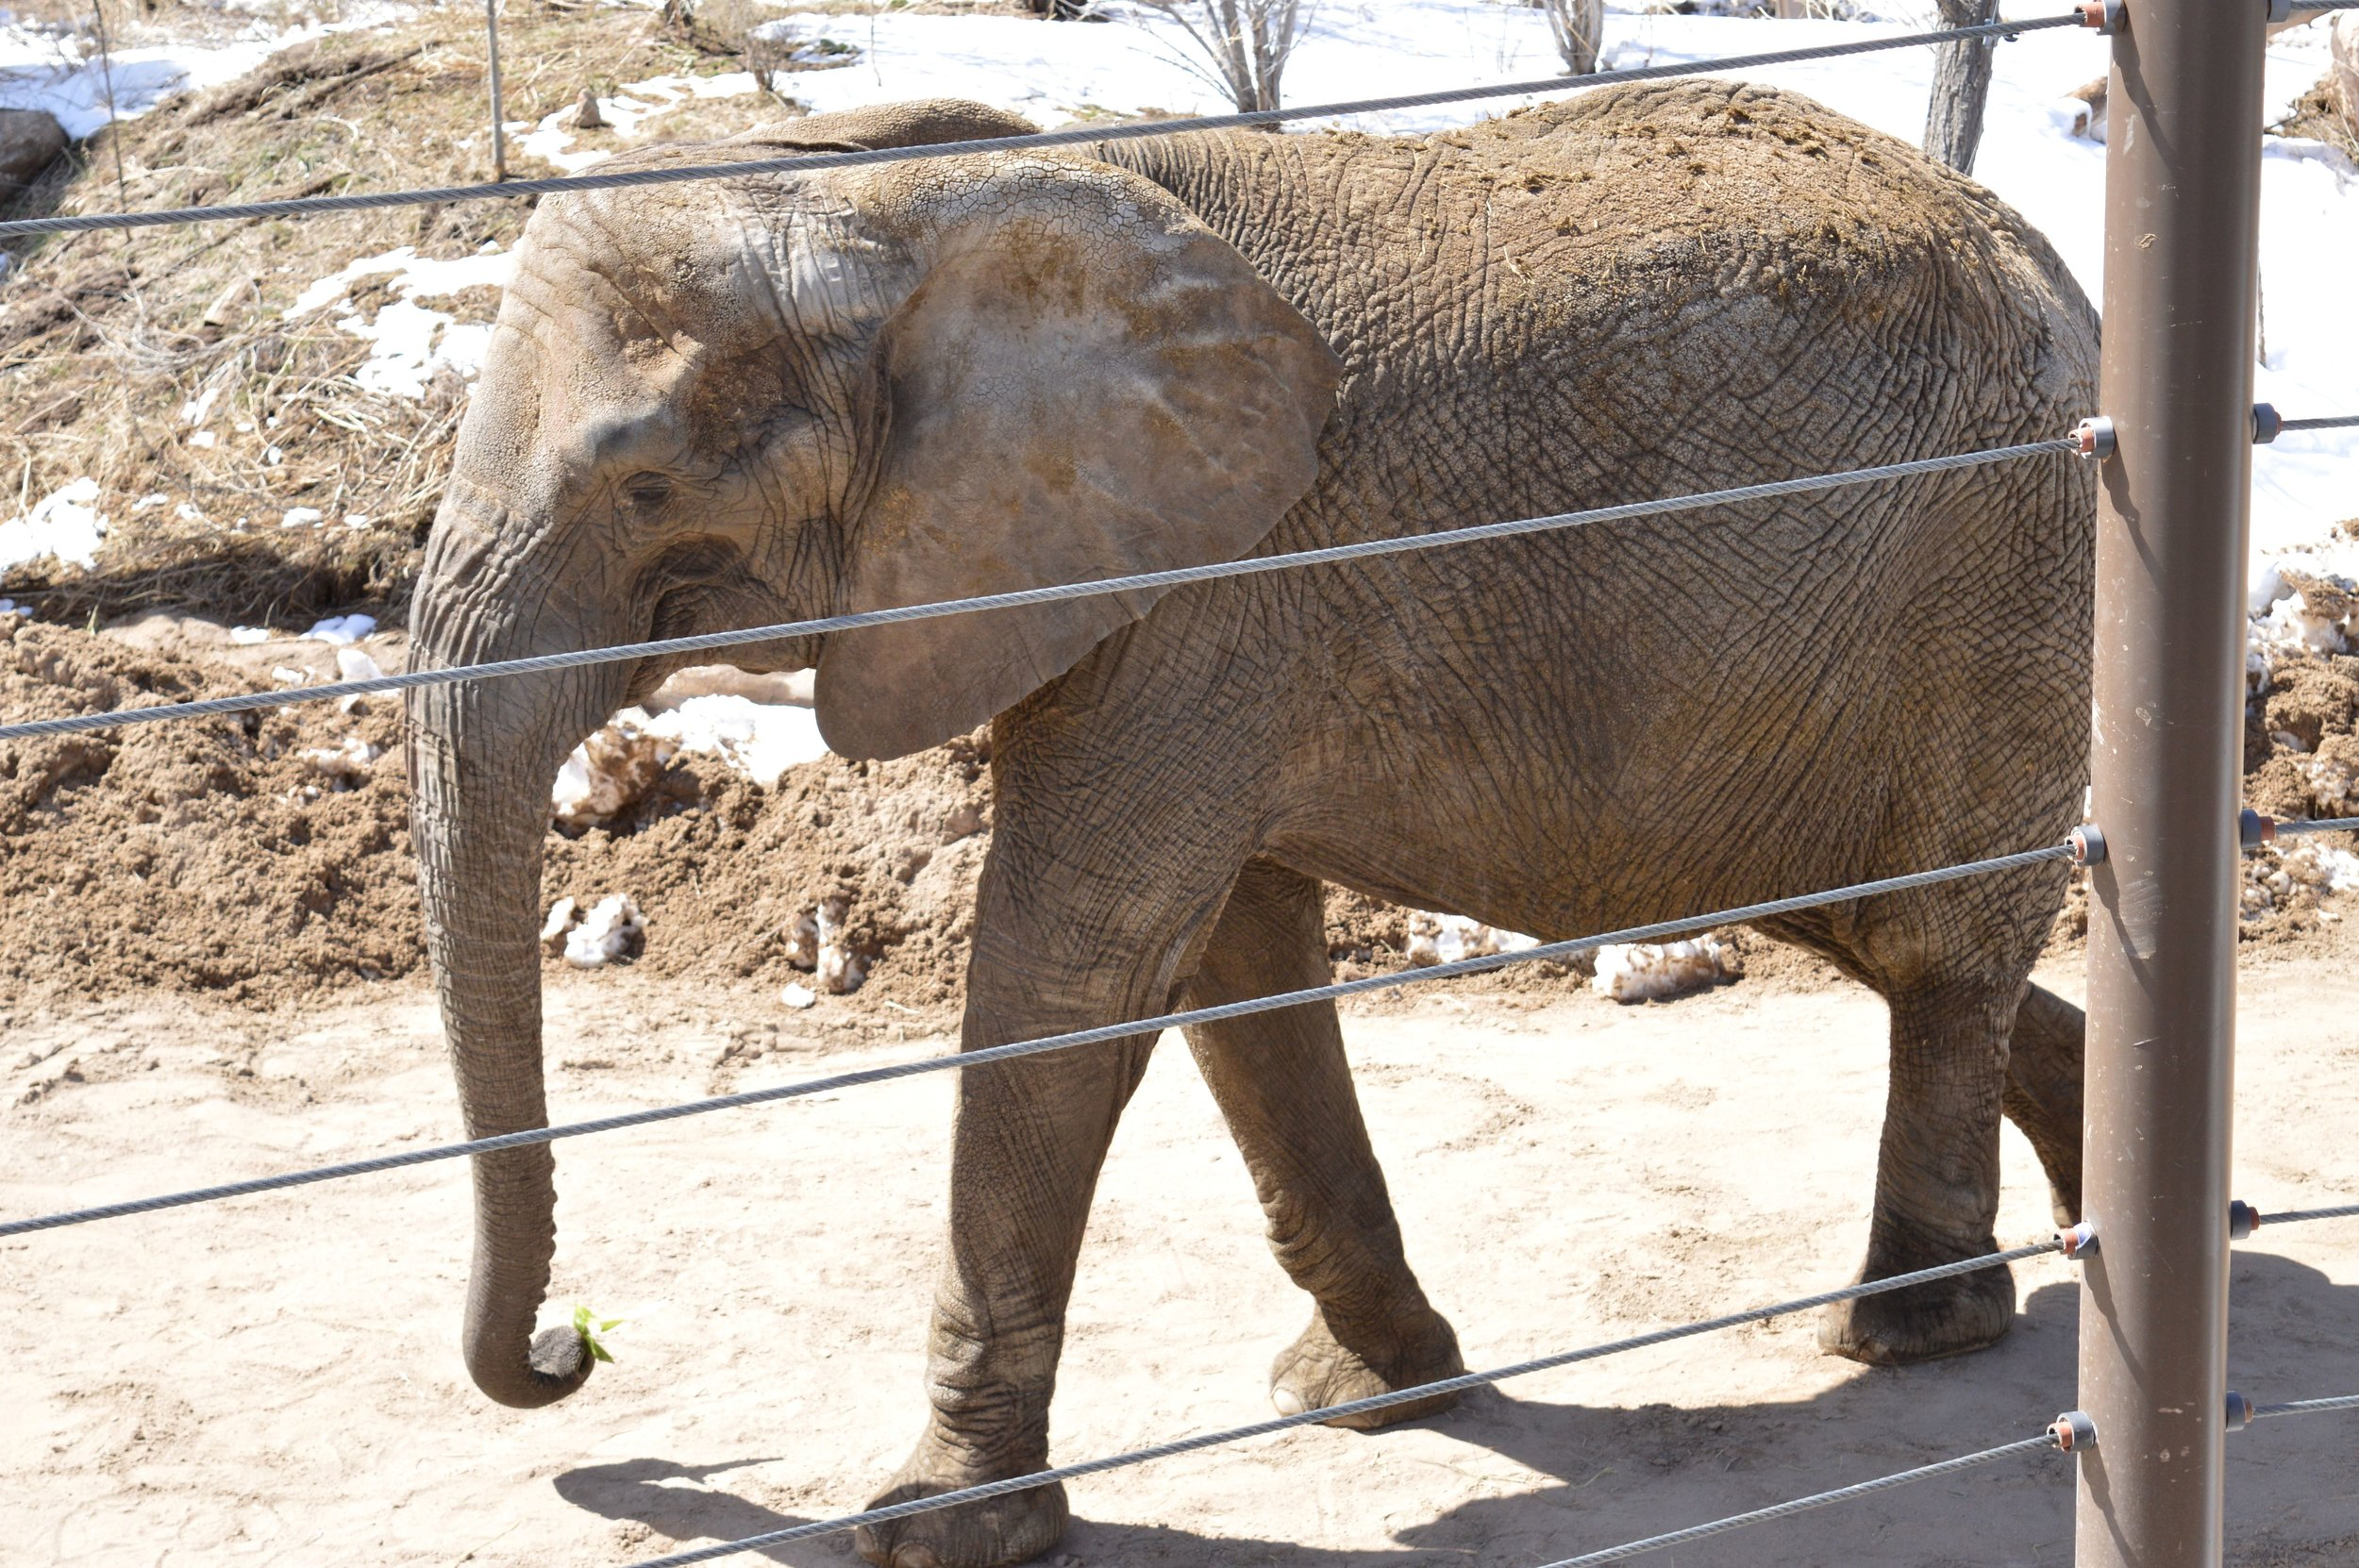 cheyenne-mountain-zoo-elephant-2.jpg